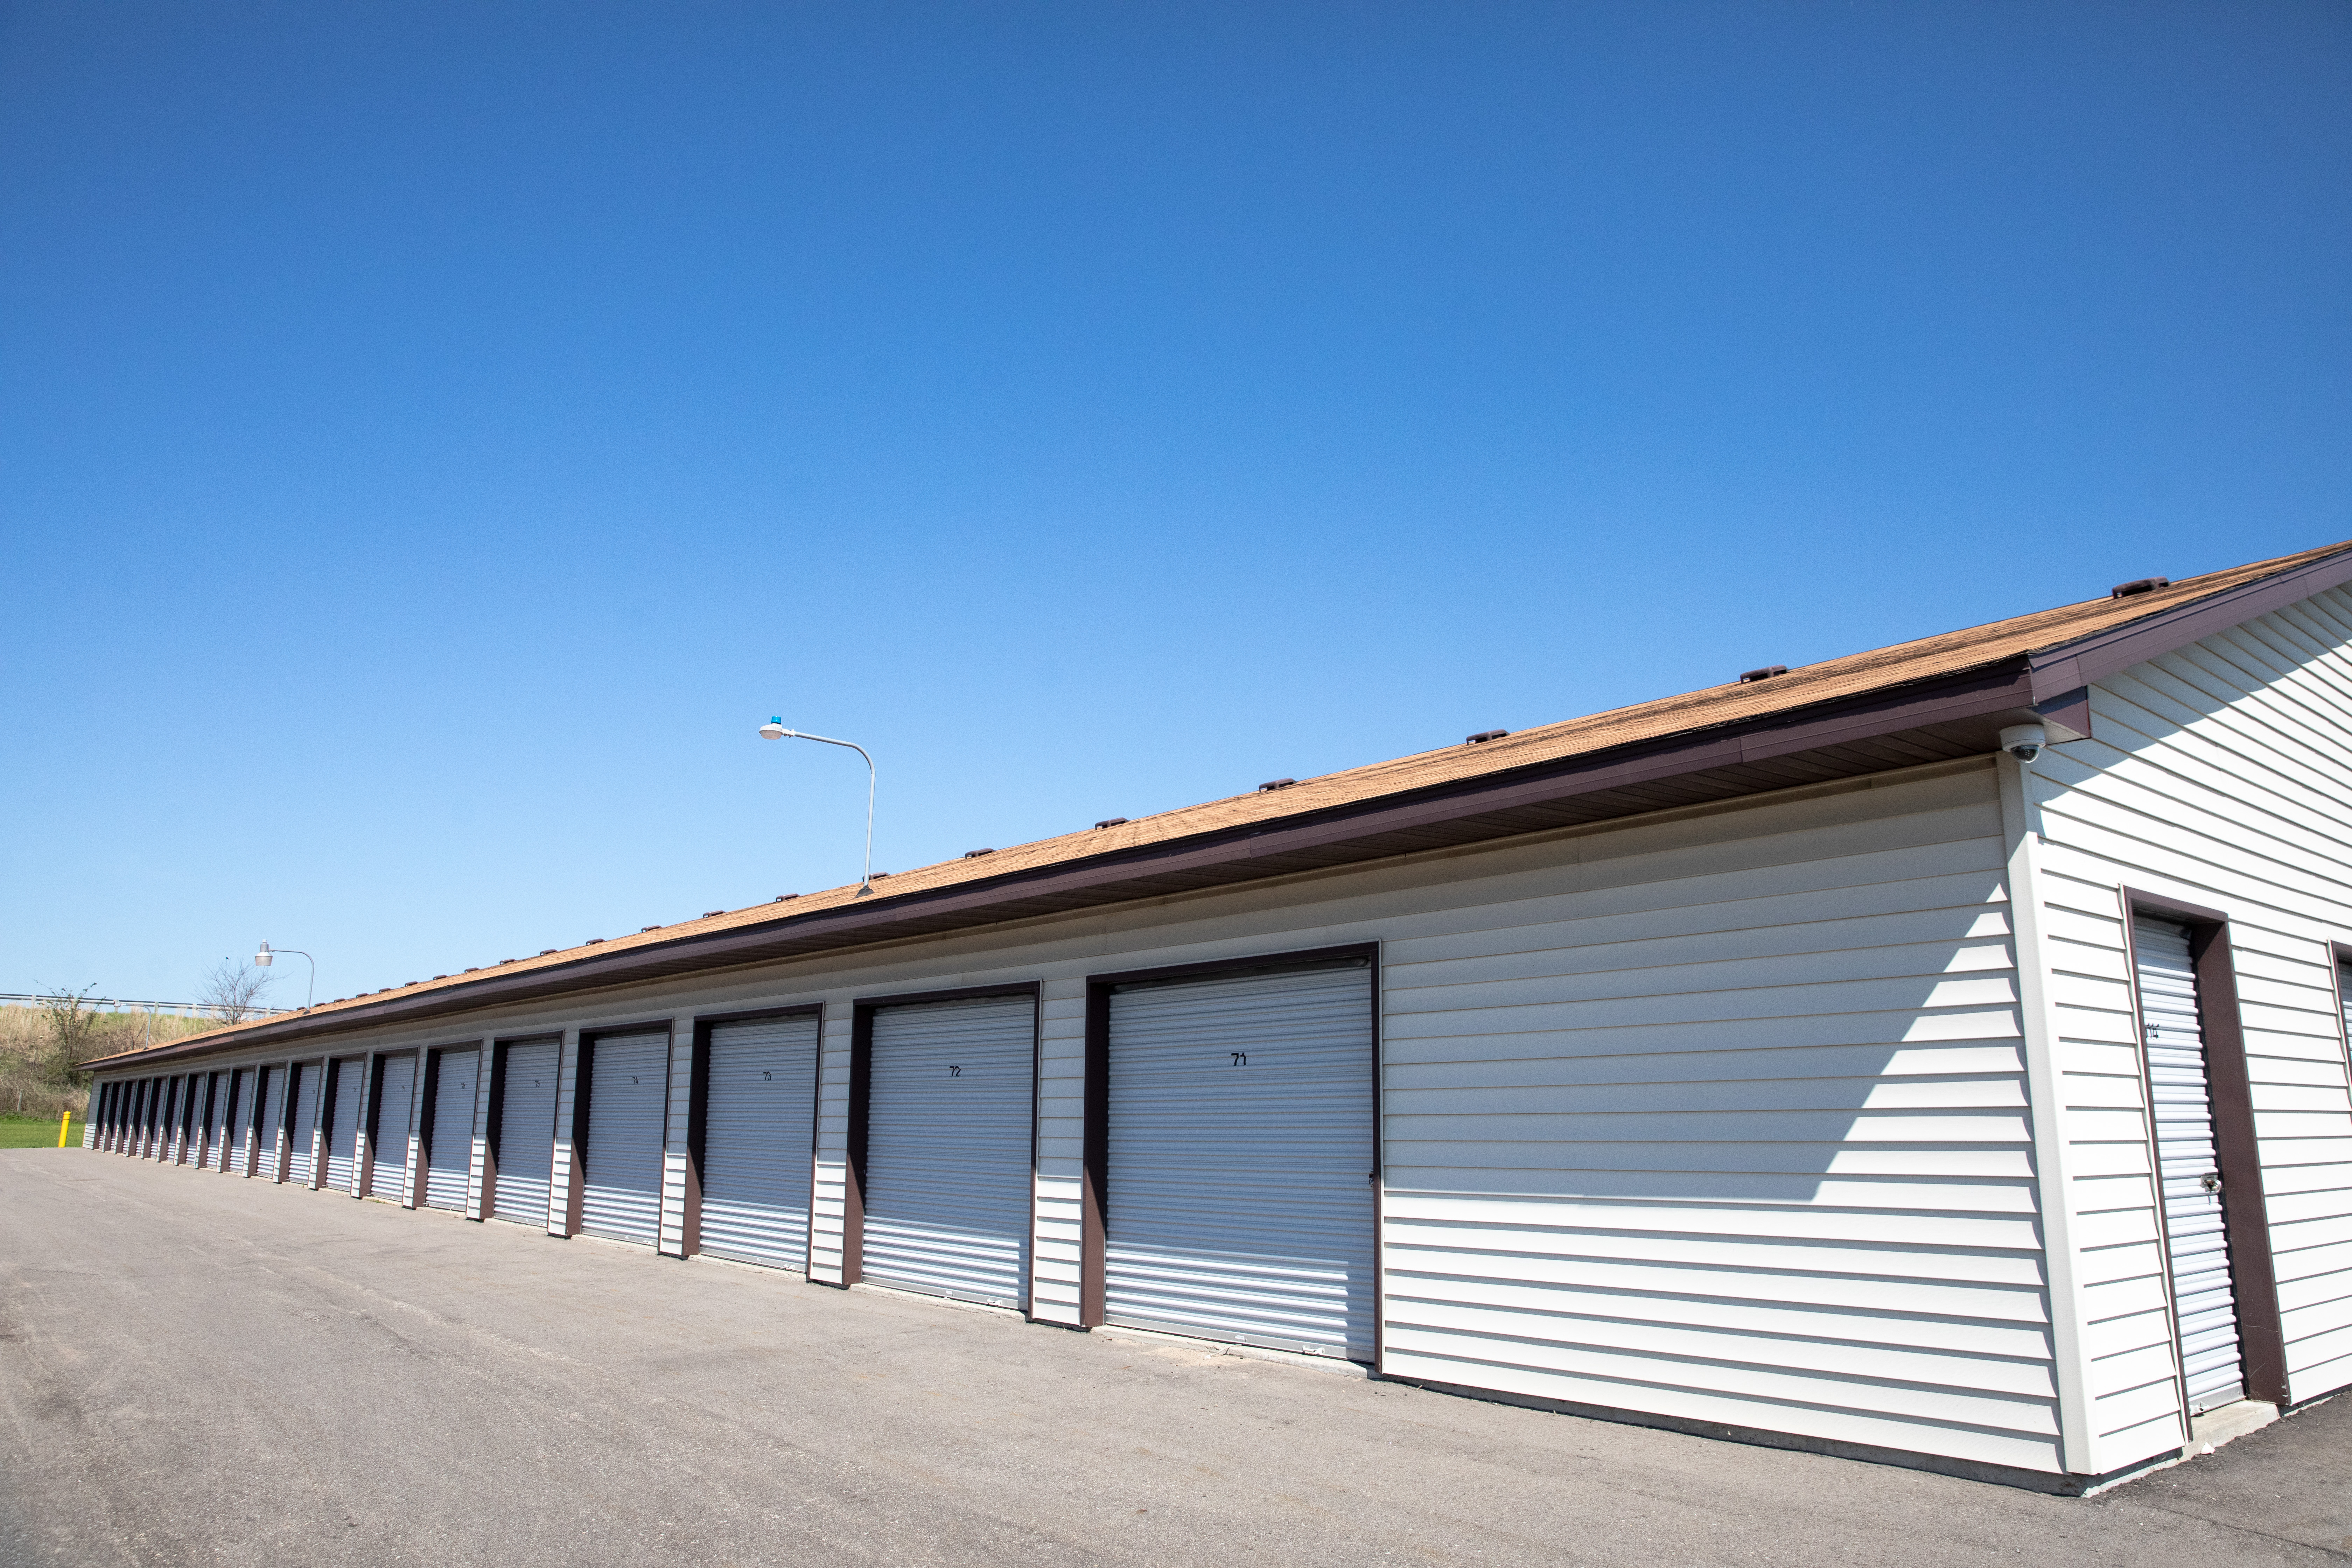 KO Storage of Portage North